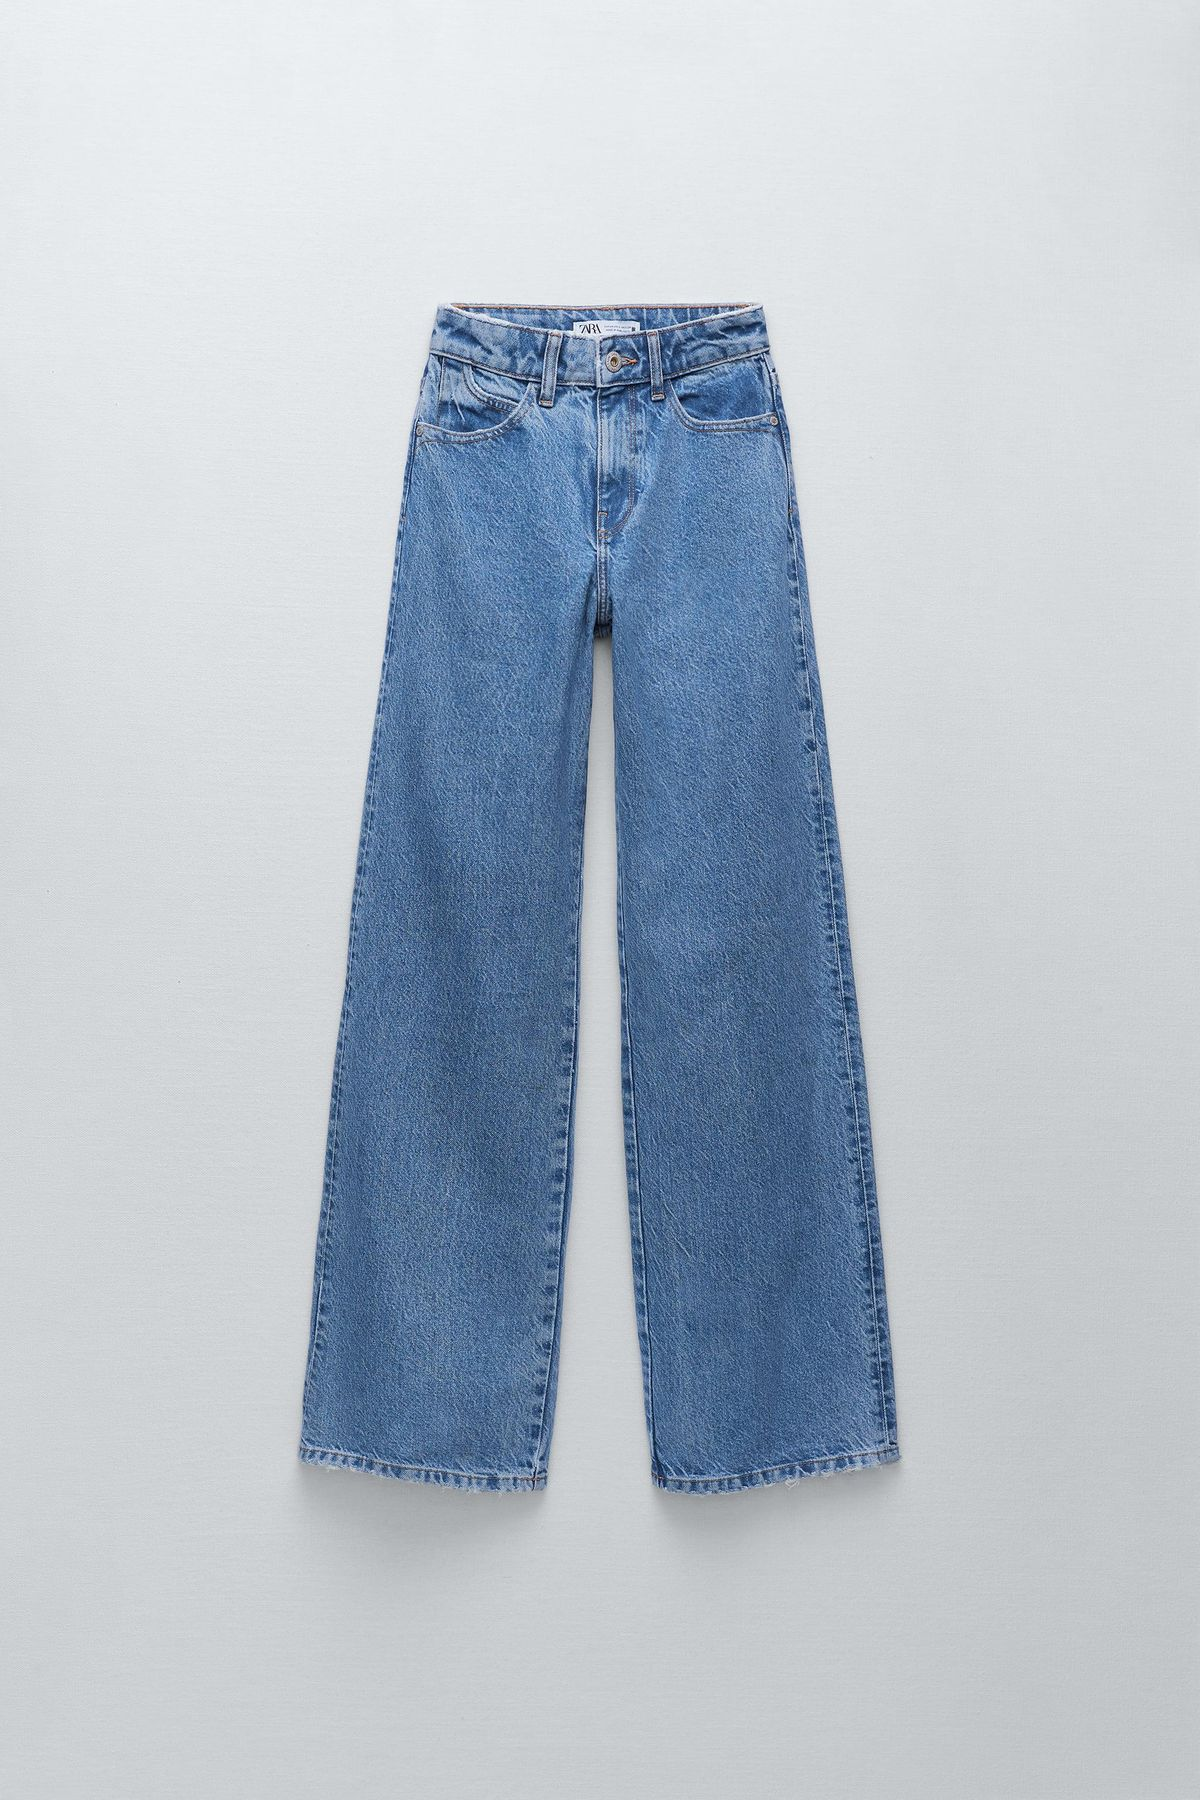 zara z1975 hi rise wide leg jeans